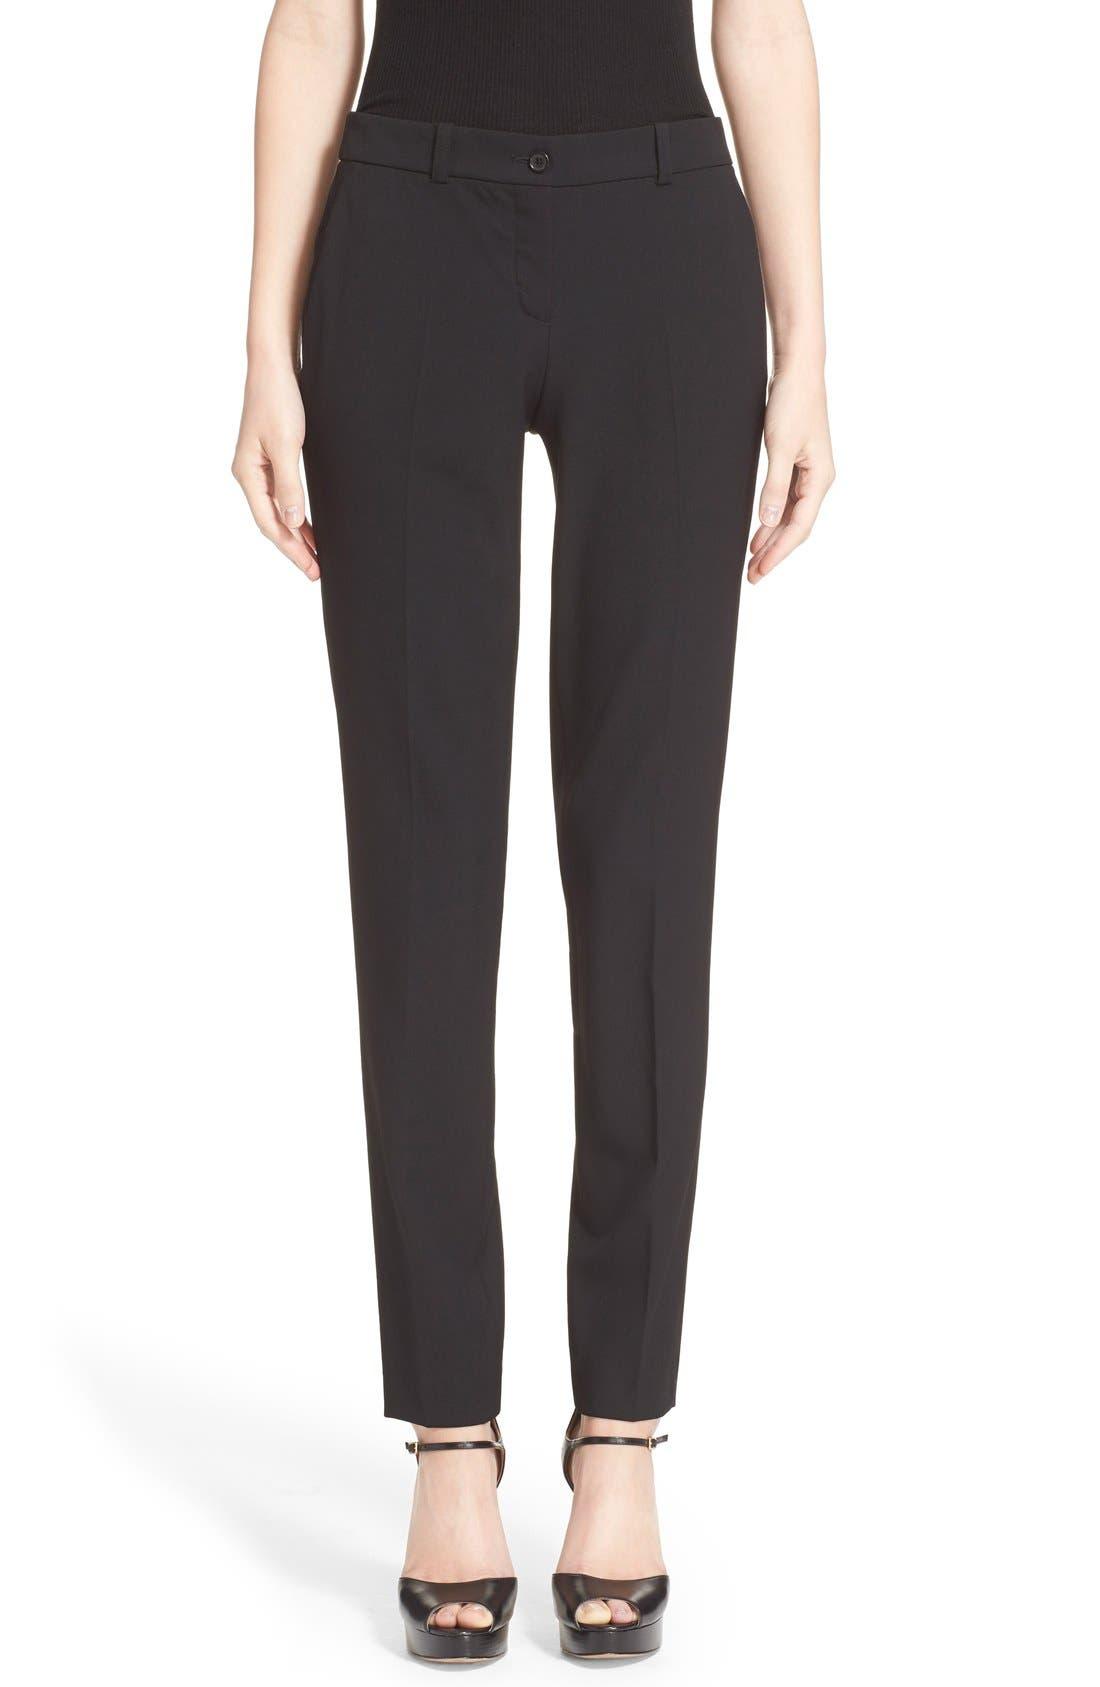 Alternate Image 1 Selected - Michael Kors 'Samantha' Stretch Wool Straight Leg Pants